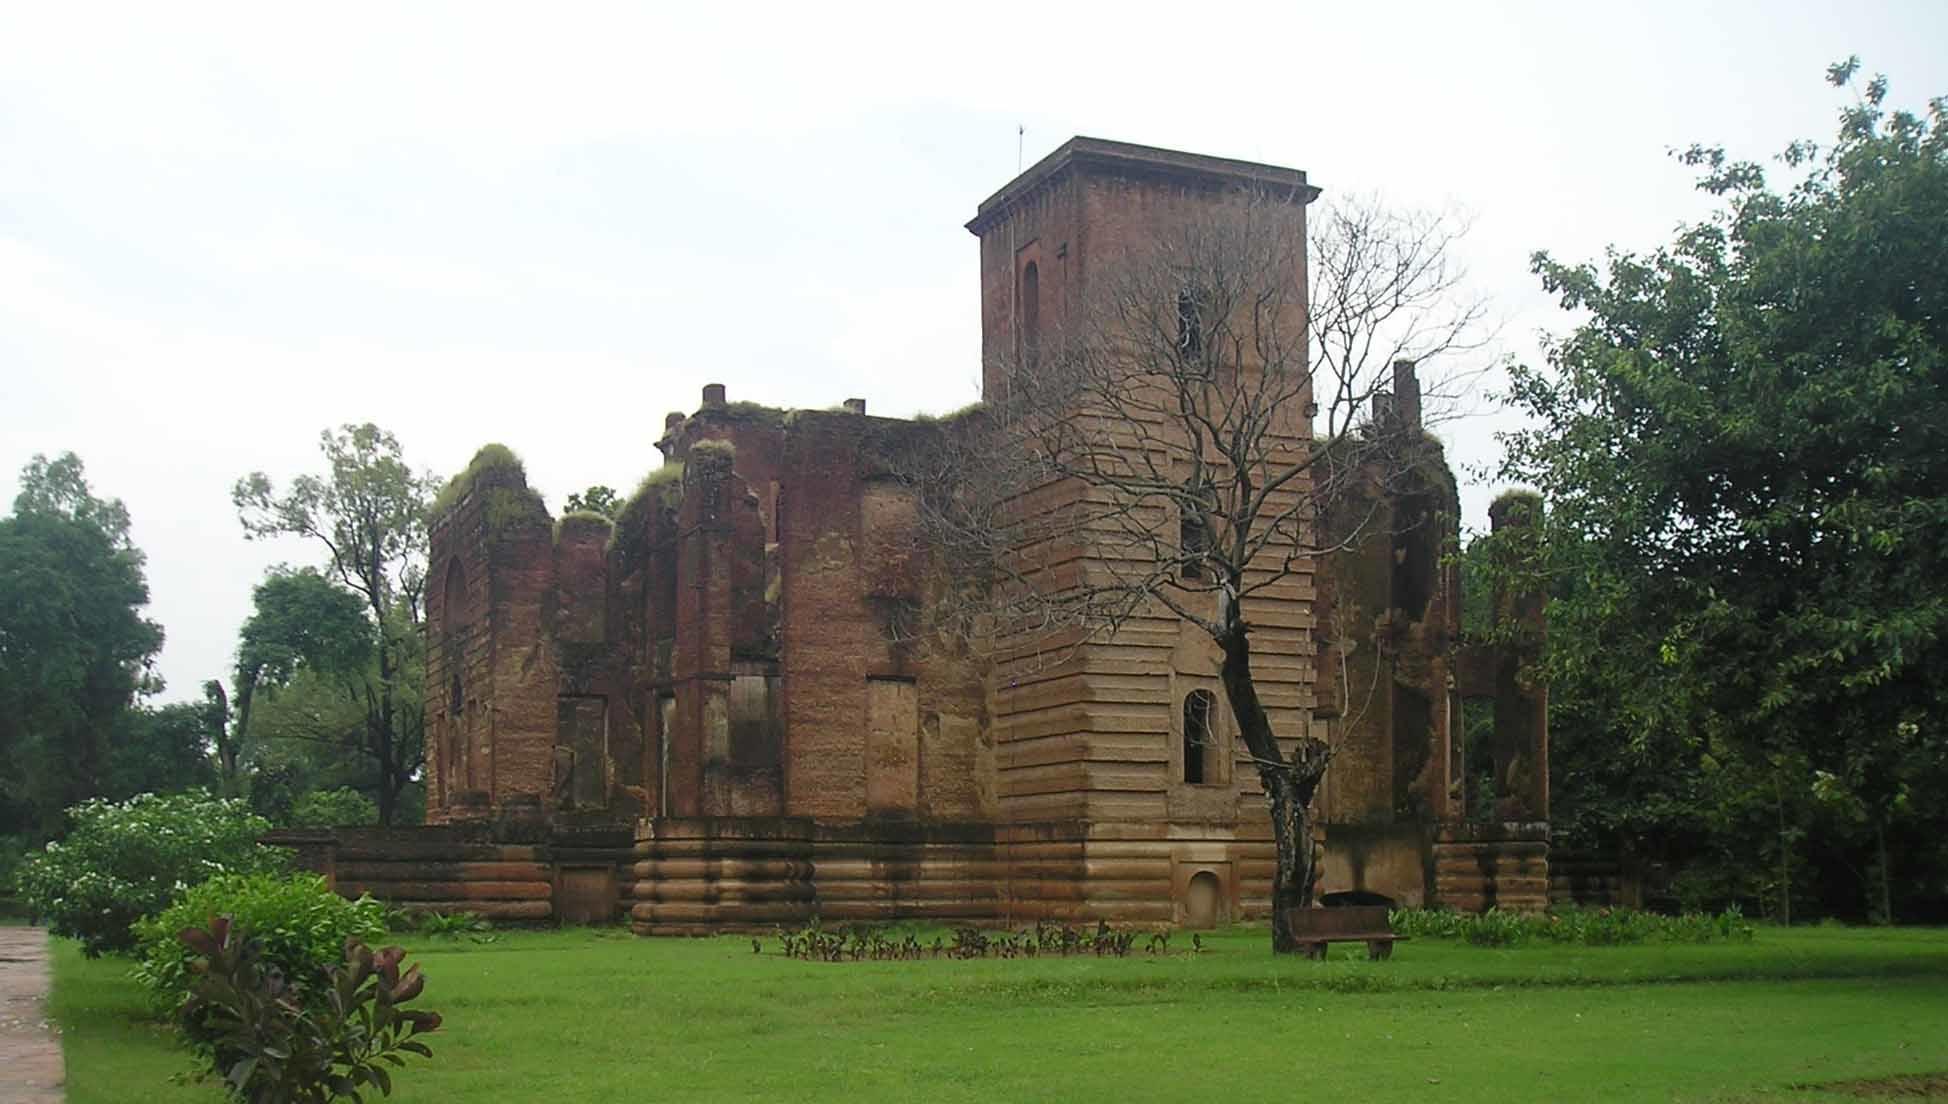 Dilkusha Kothi Top Place to Visit in Lucknow